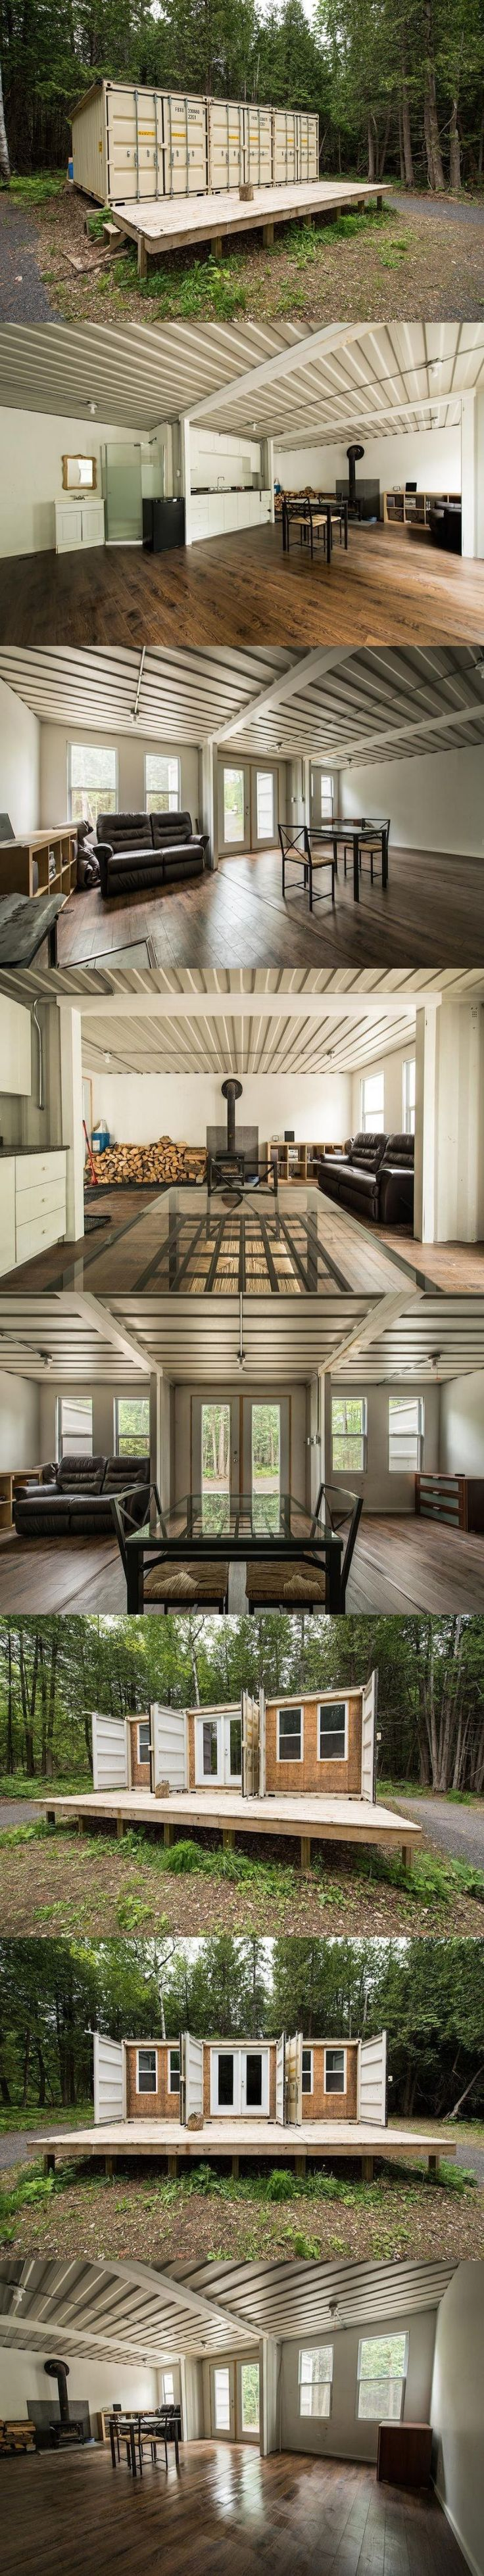 78 best Container Häuser images on Pinterest | Container häuser ...